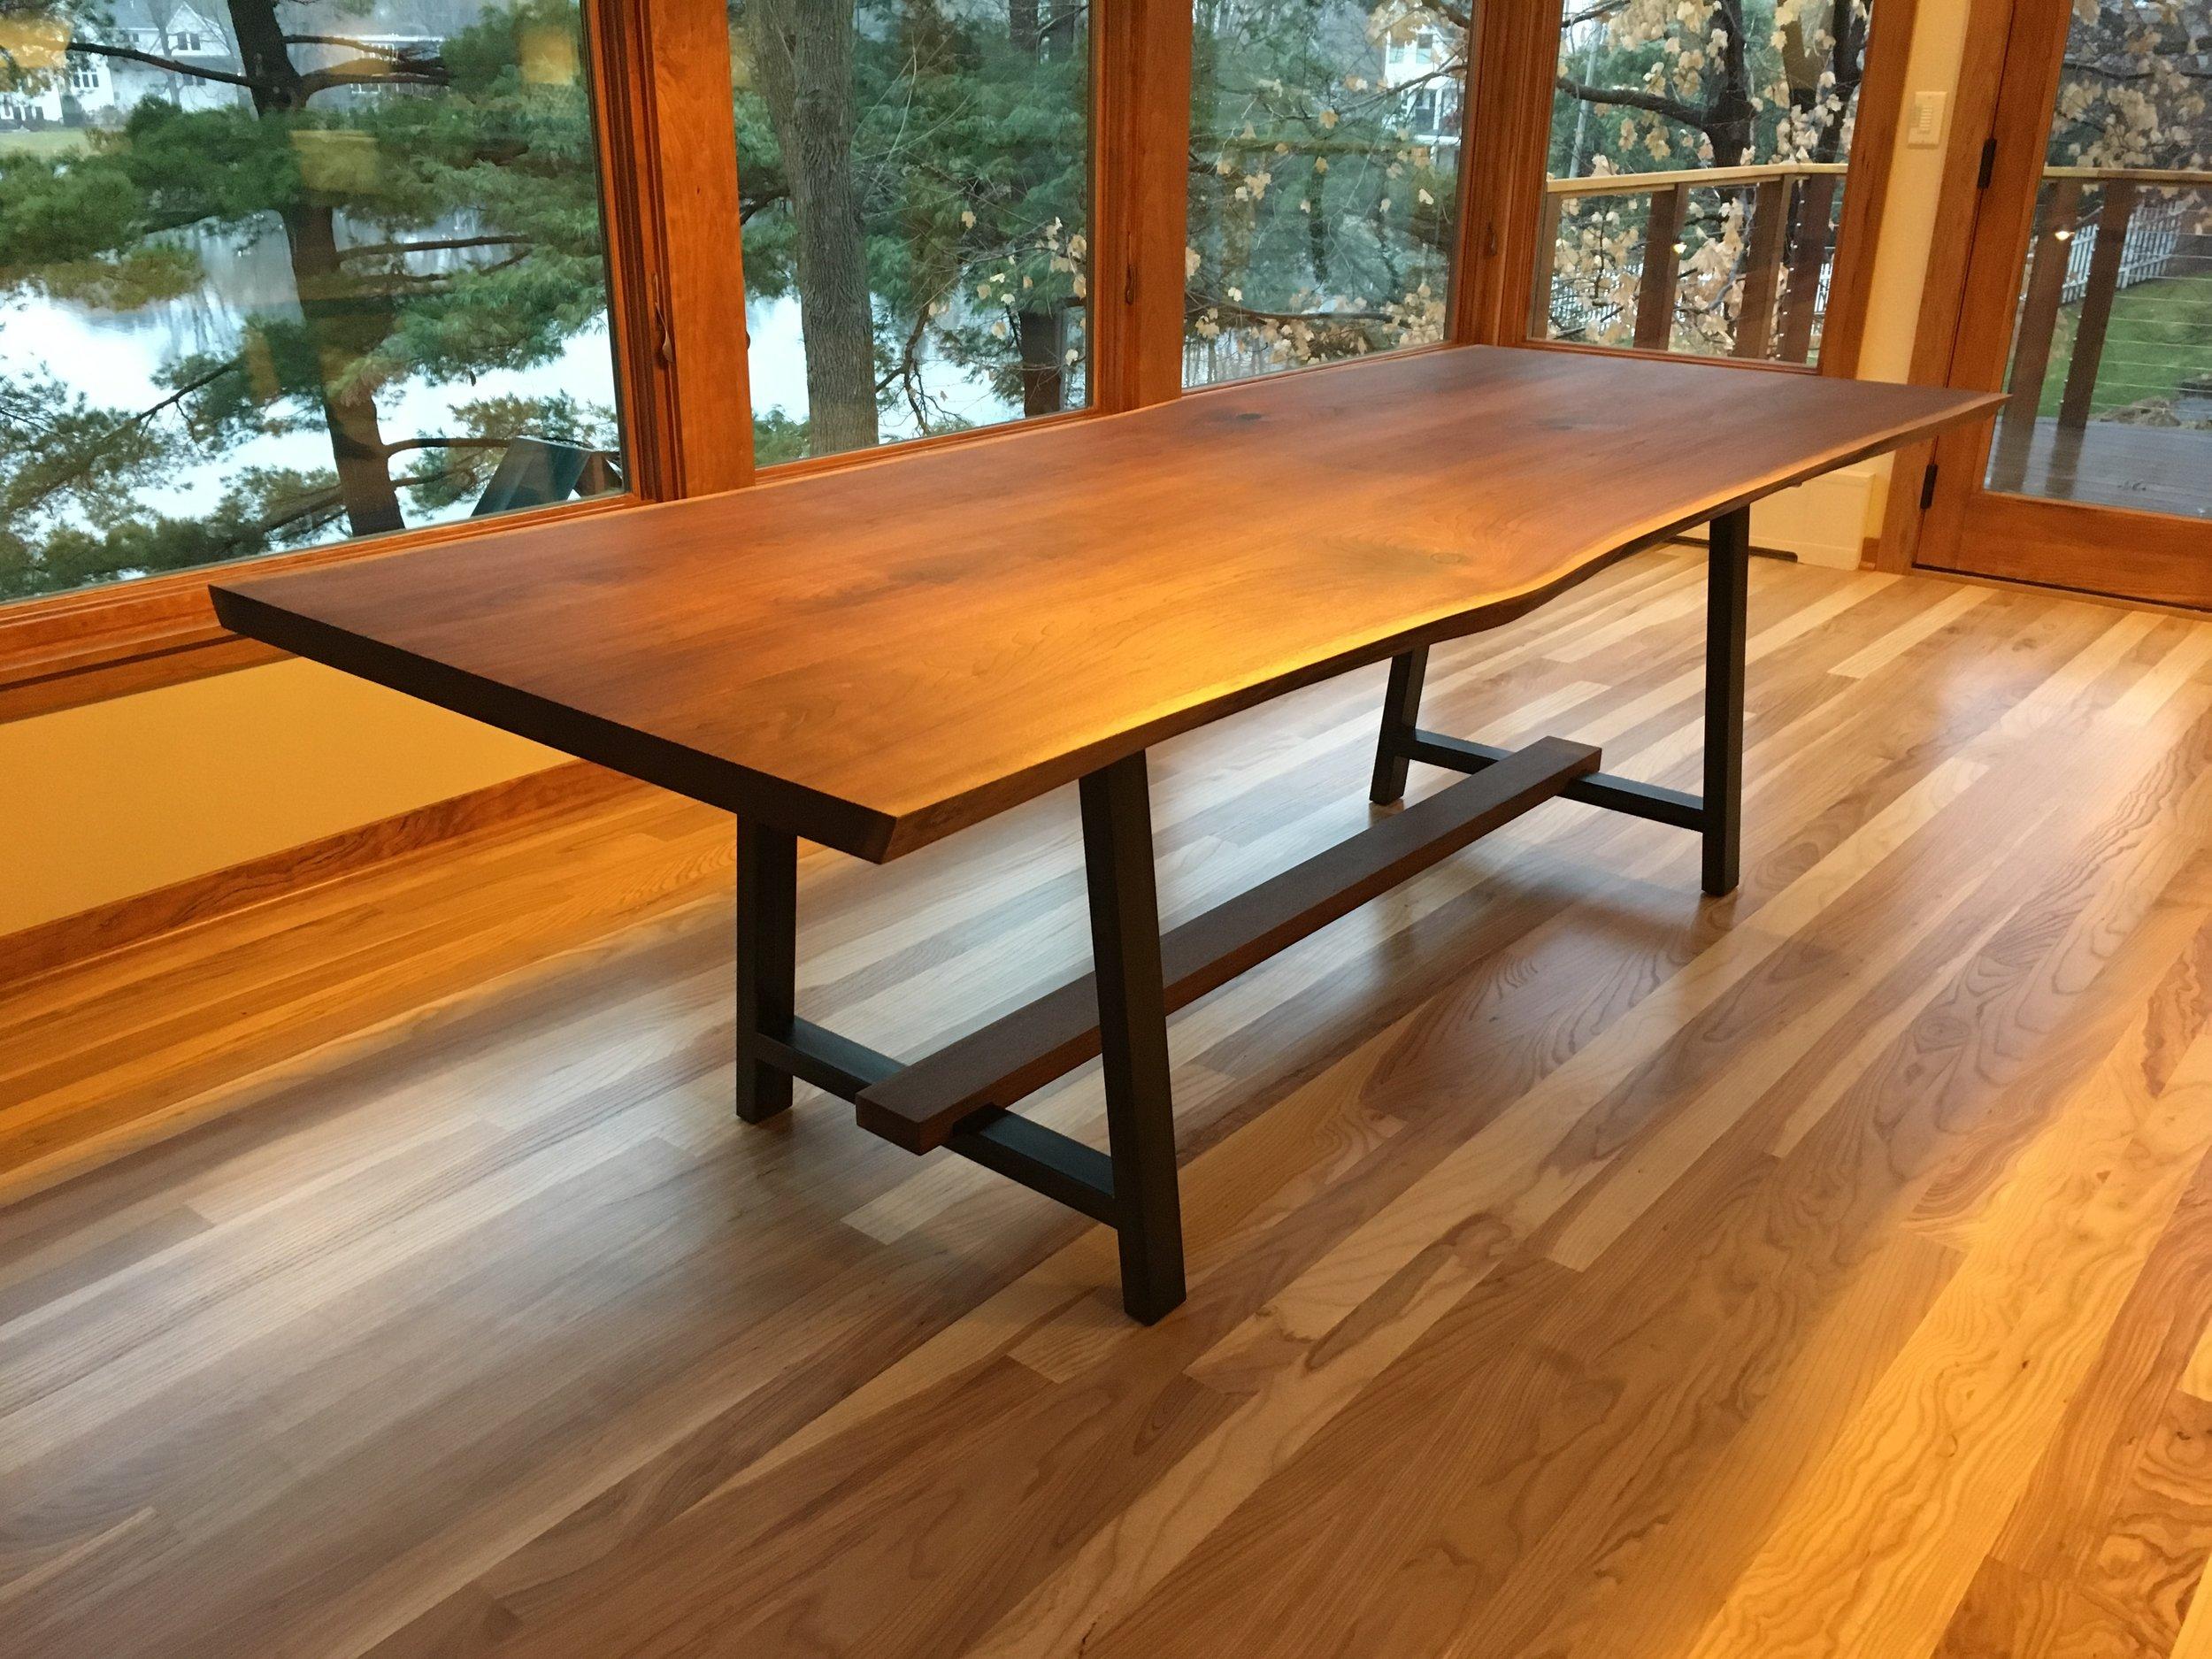 Custom live edge walnut dining table with steel legs.